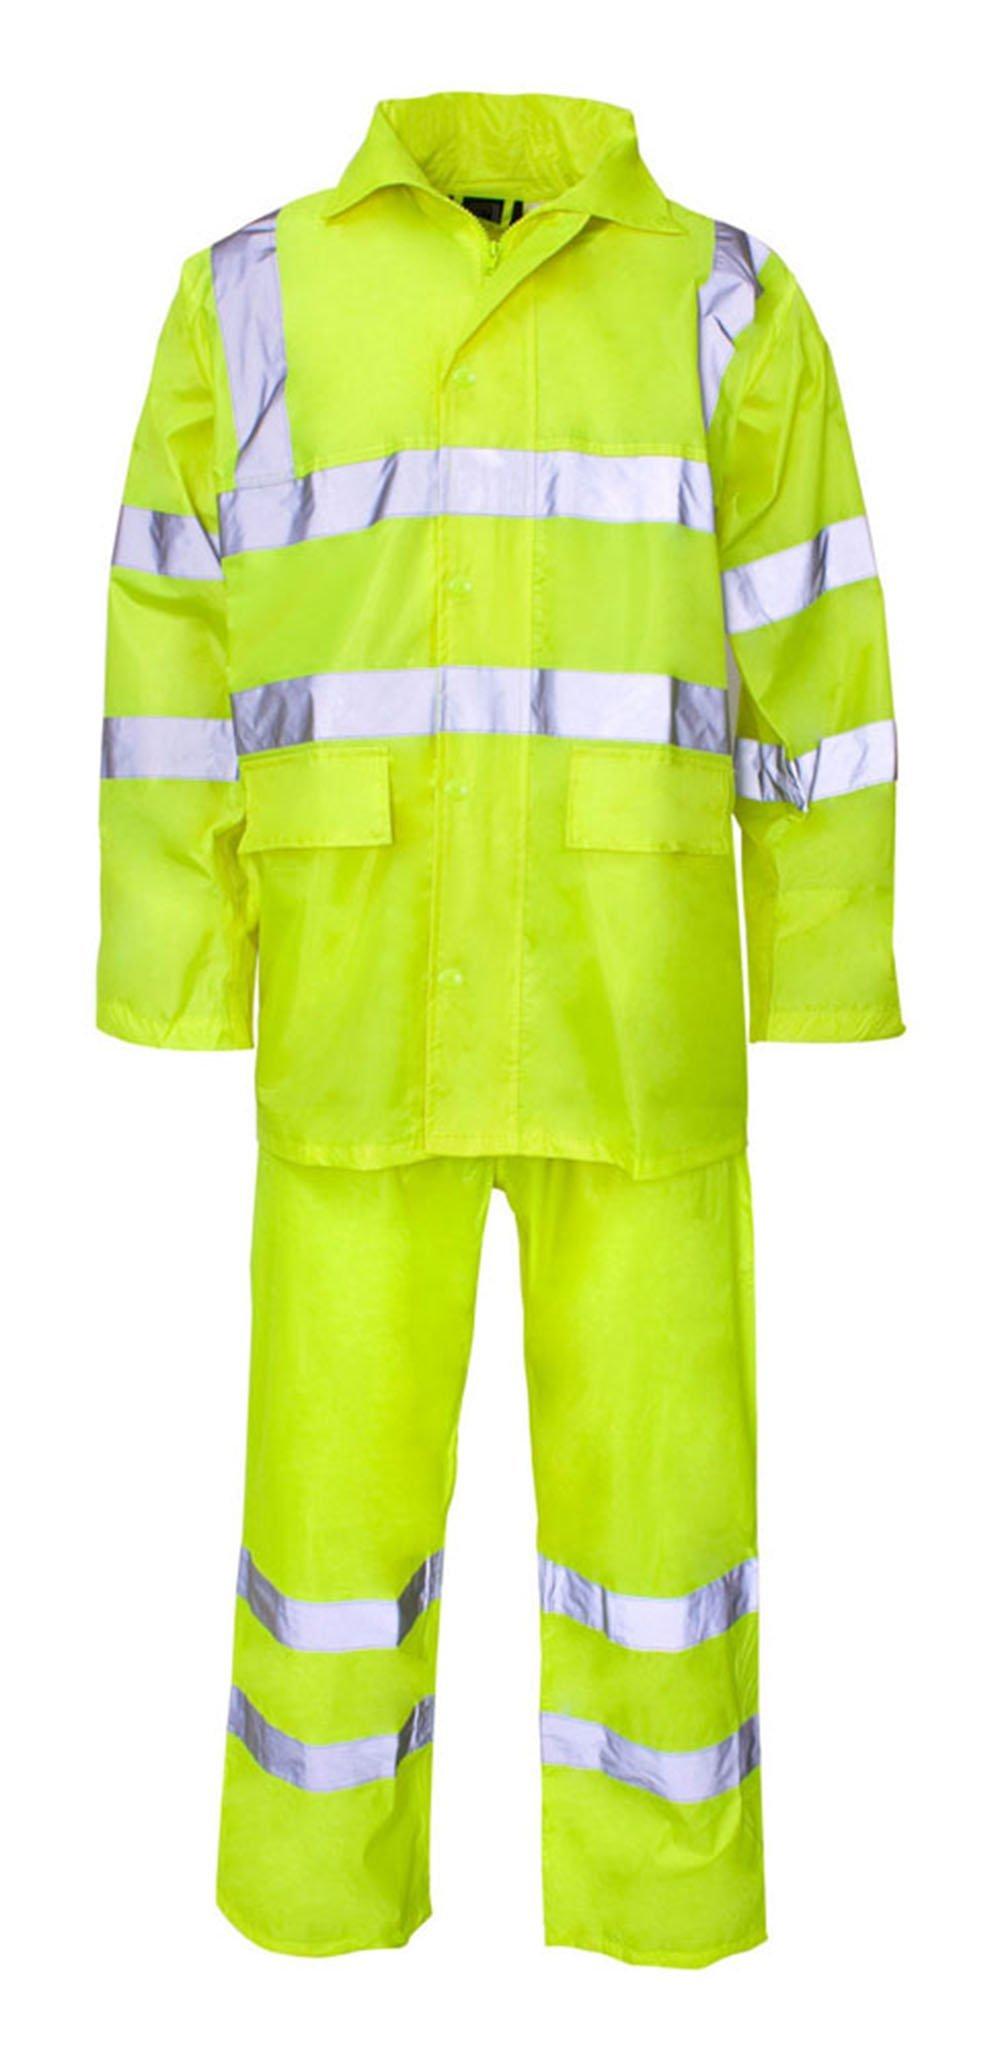 Forever Hi Viz Waterproof Rainsuit Set High Vis Visibility Jacket & Trouser